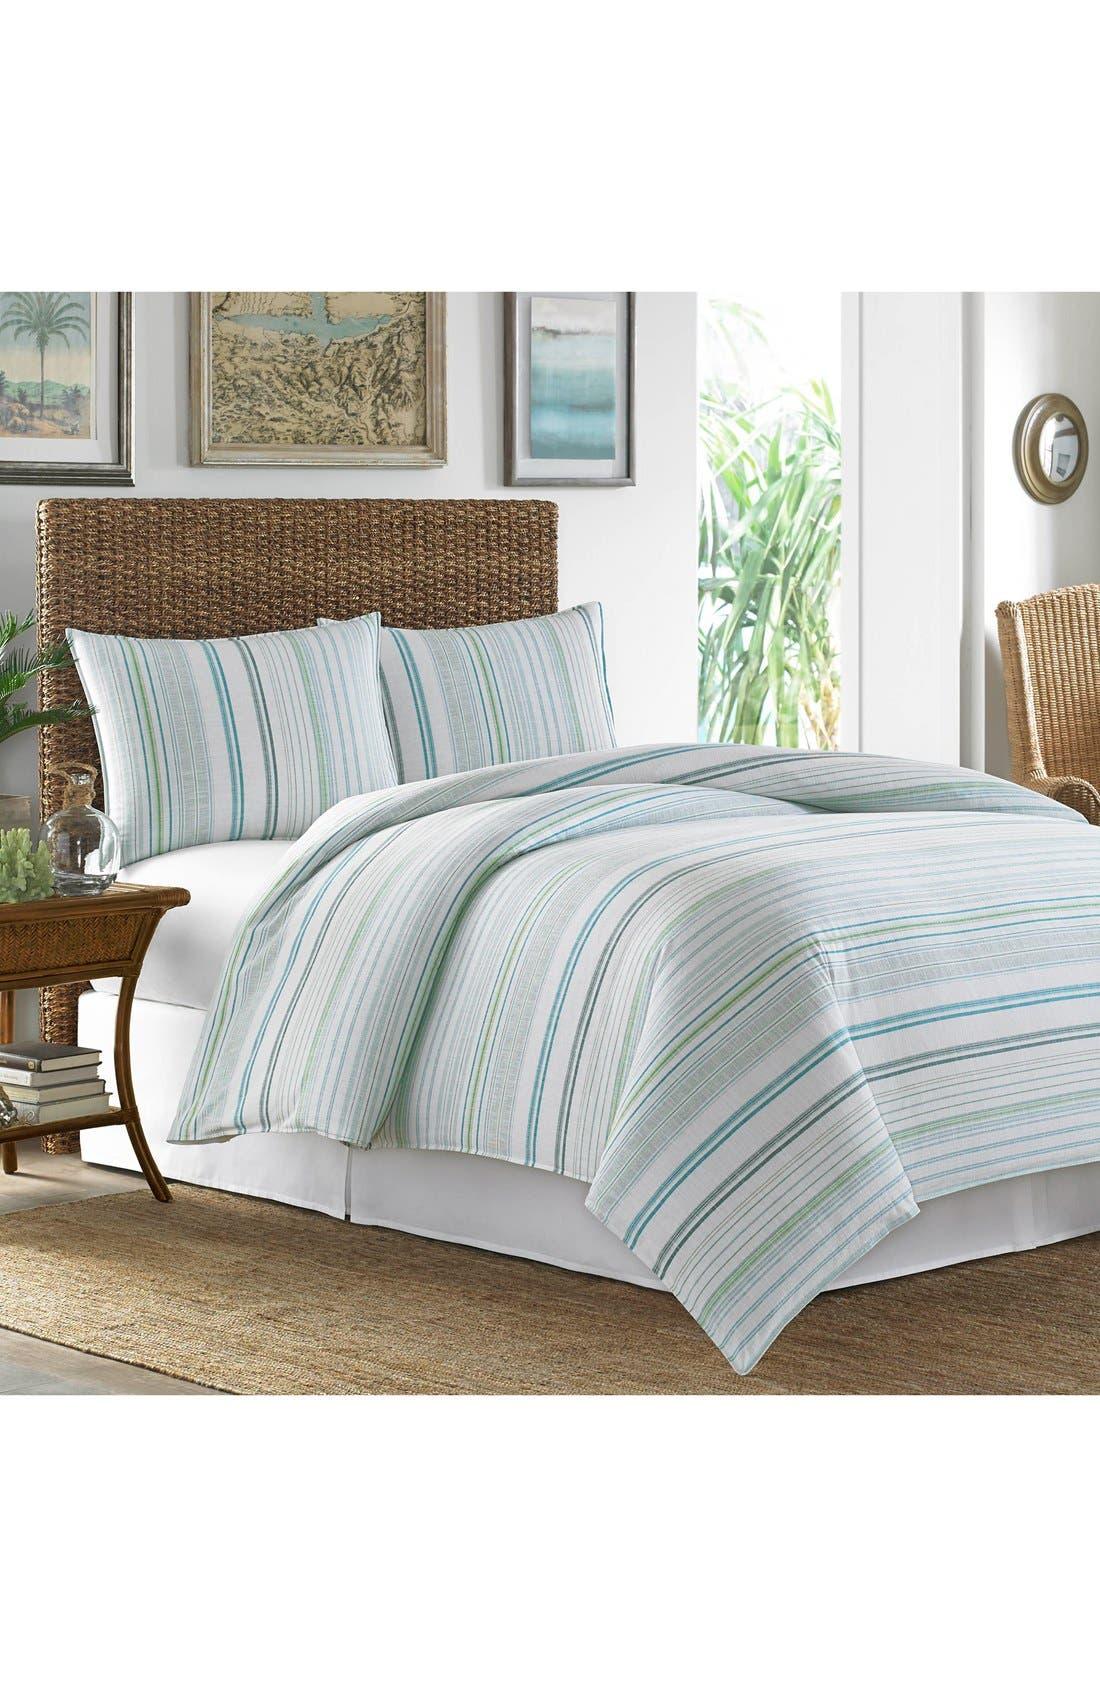 La Scala Breezer Comforter, Sham & Bed Skirt Set,                             Main thumbnail 1, color,                             440